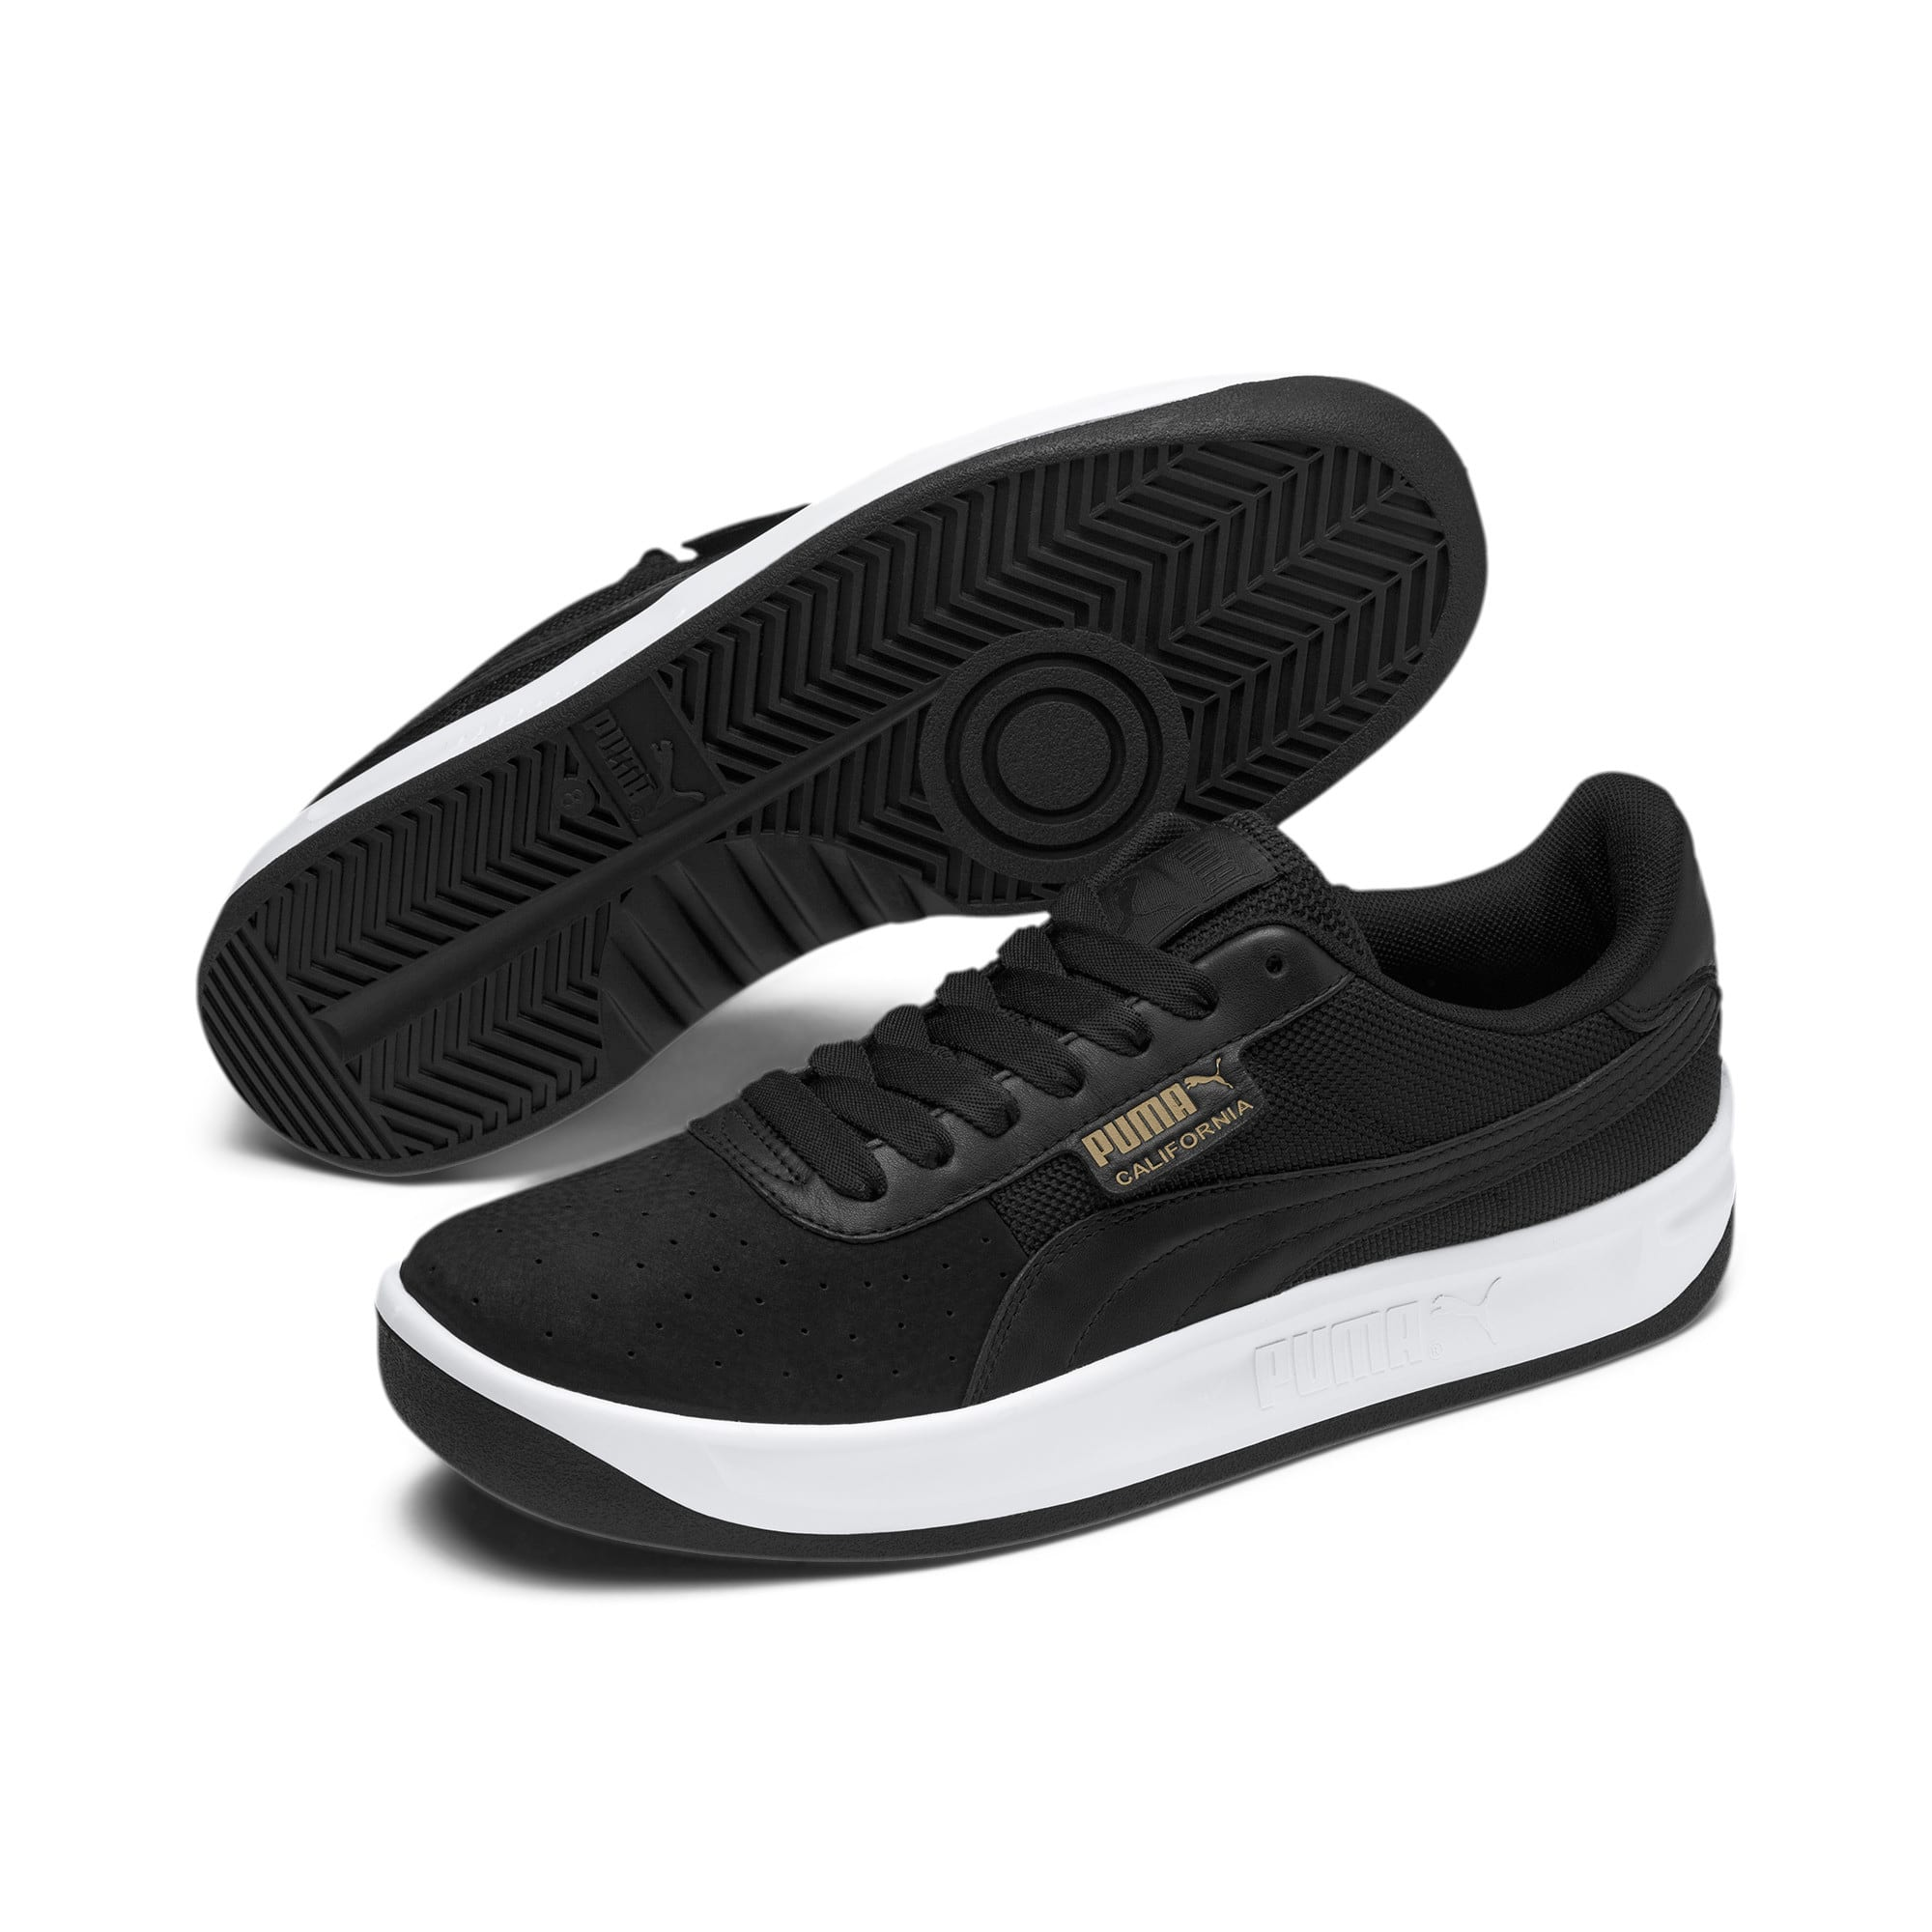 Miniatura 3 de Zapatos deportivos California, P Black-P White-P Black, mediano